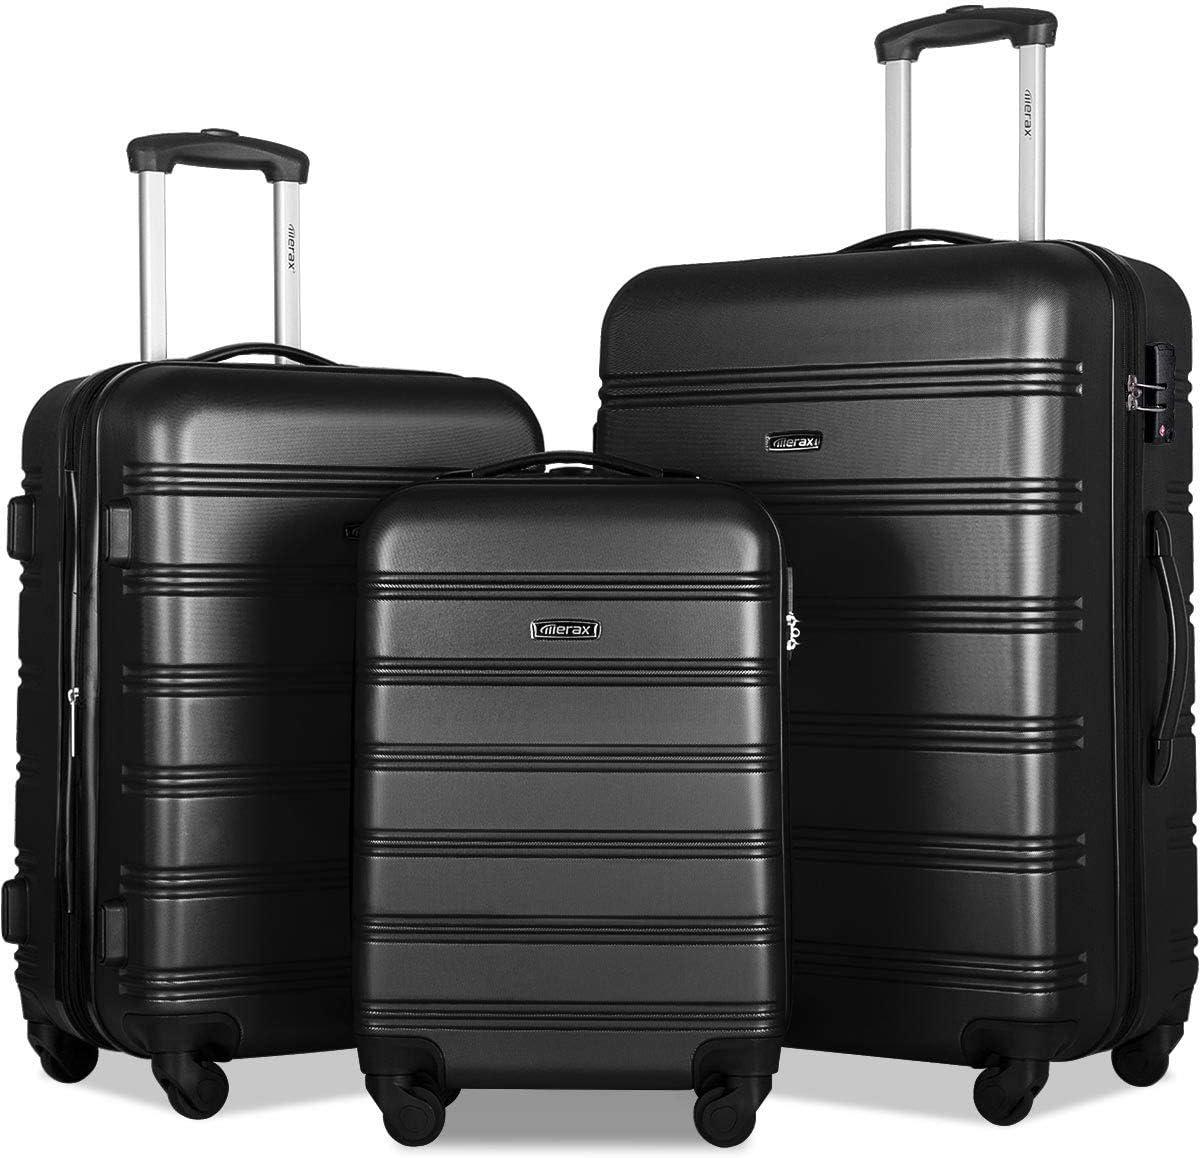 Merax Expandable Luggage Sets with TSA Locks, 3 Piece Lightweight Spinner Suitcase Set Black2020